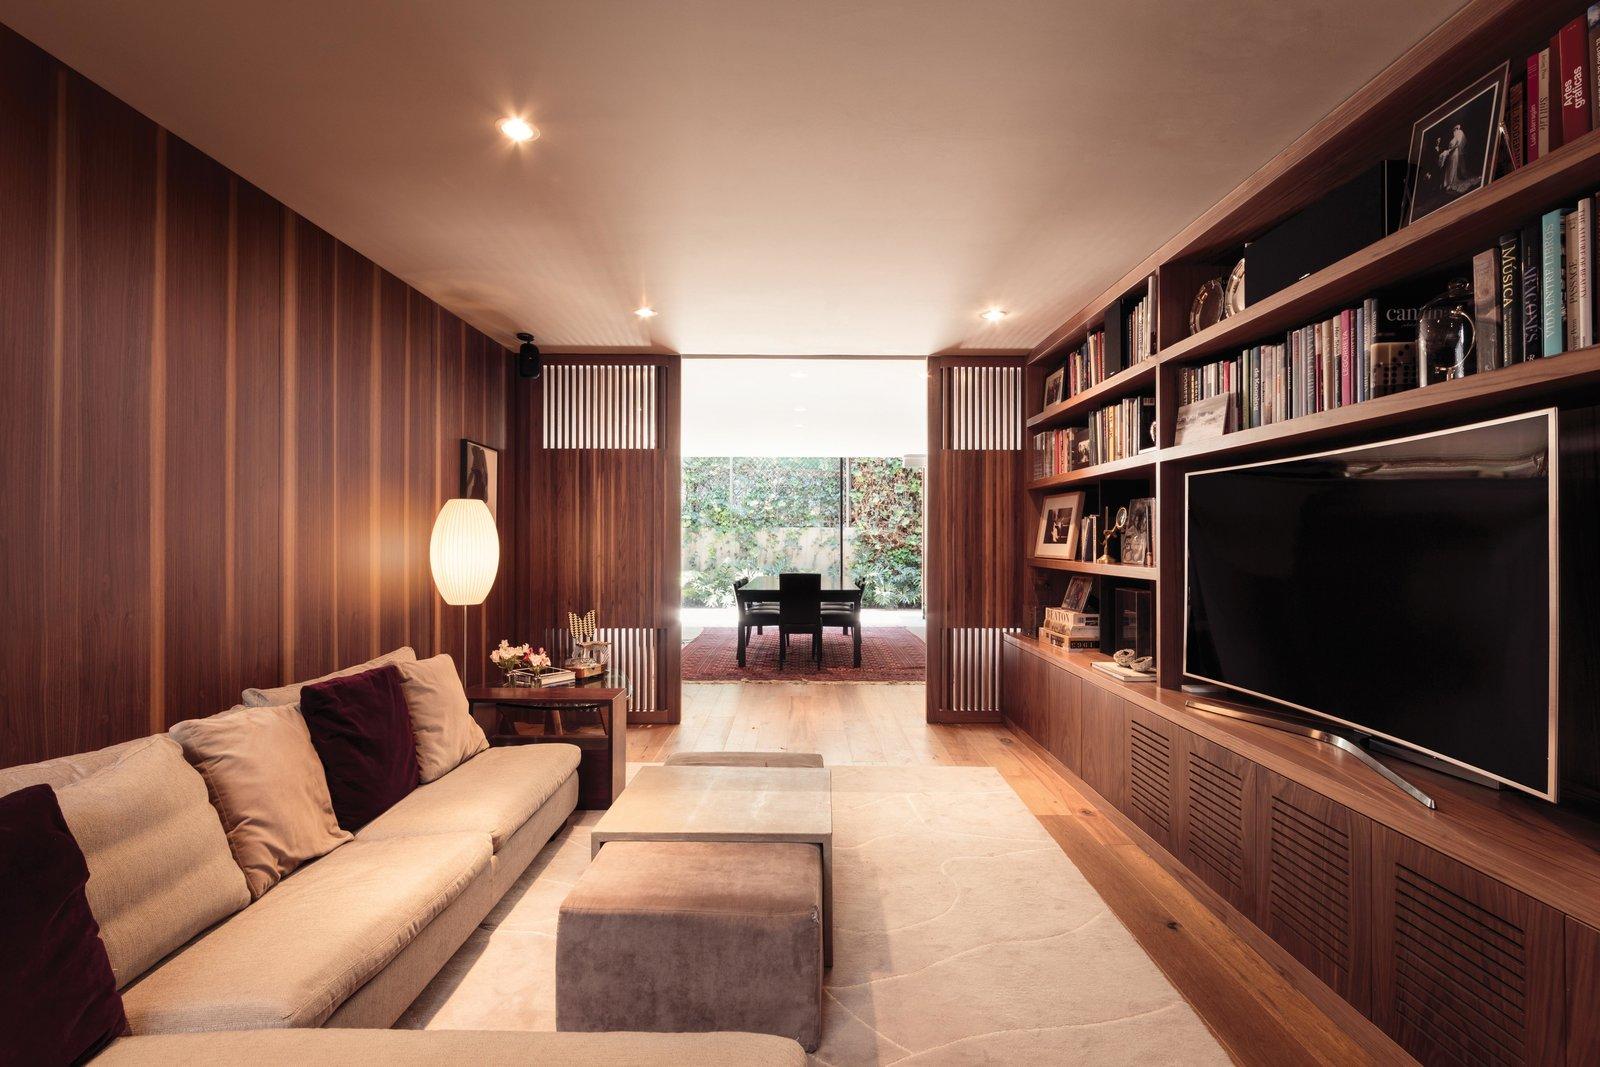 Living Room, Sofa, Coffee Tables, and Medium Hardwood Floor SIERRA FRIA  Best Photos from Sierra Fria